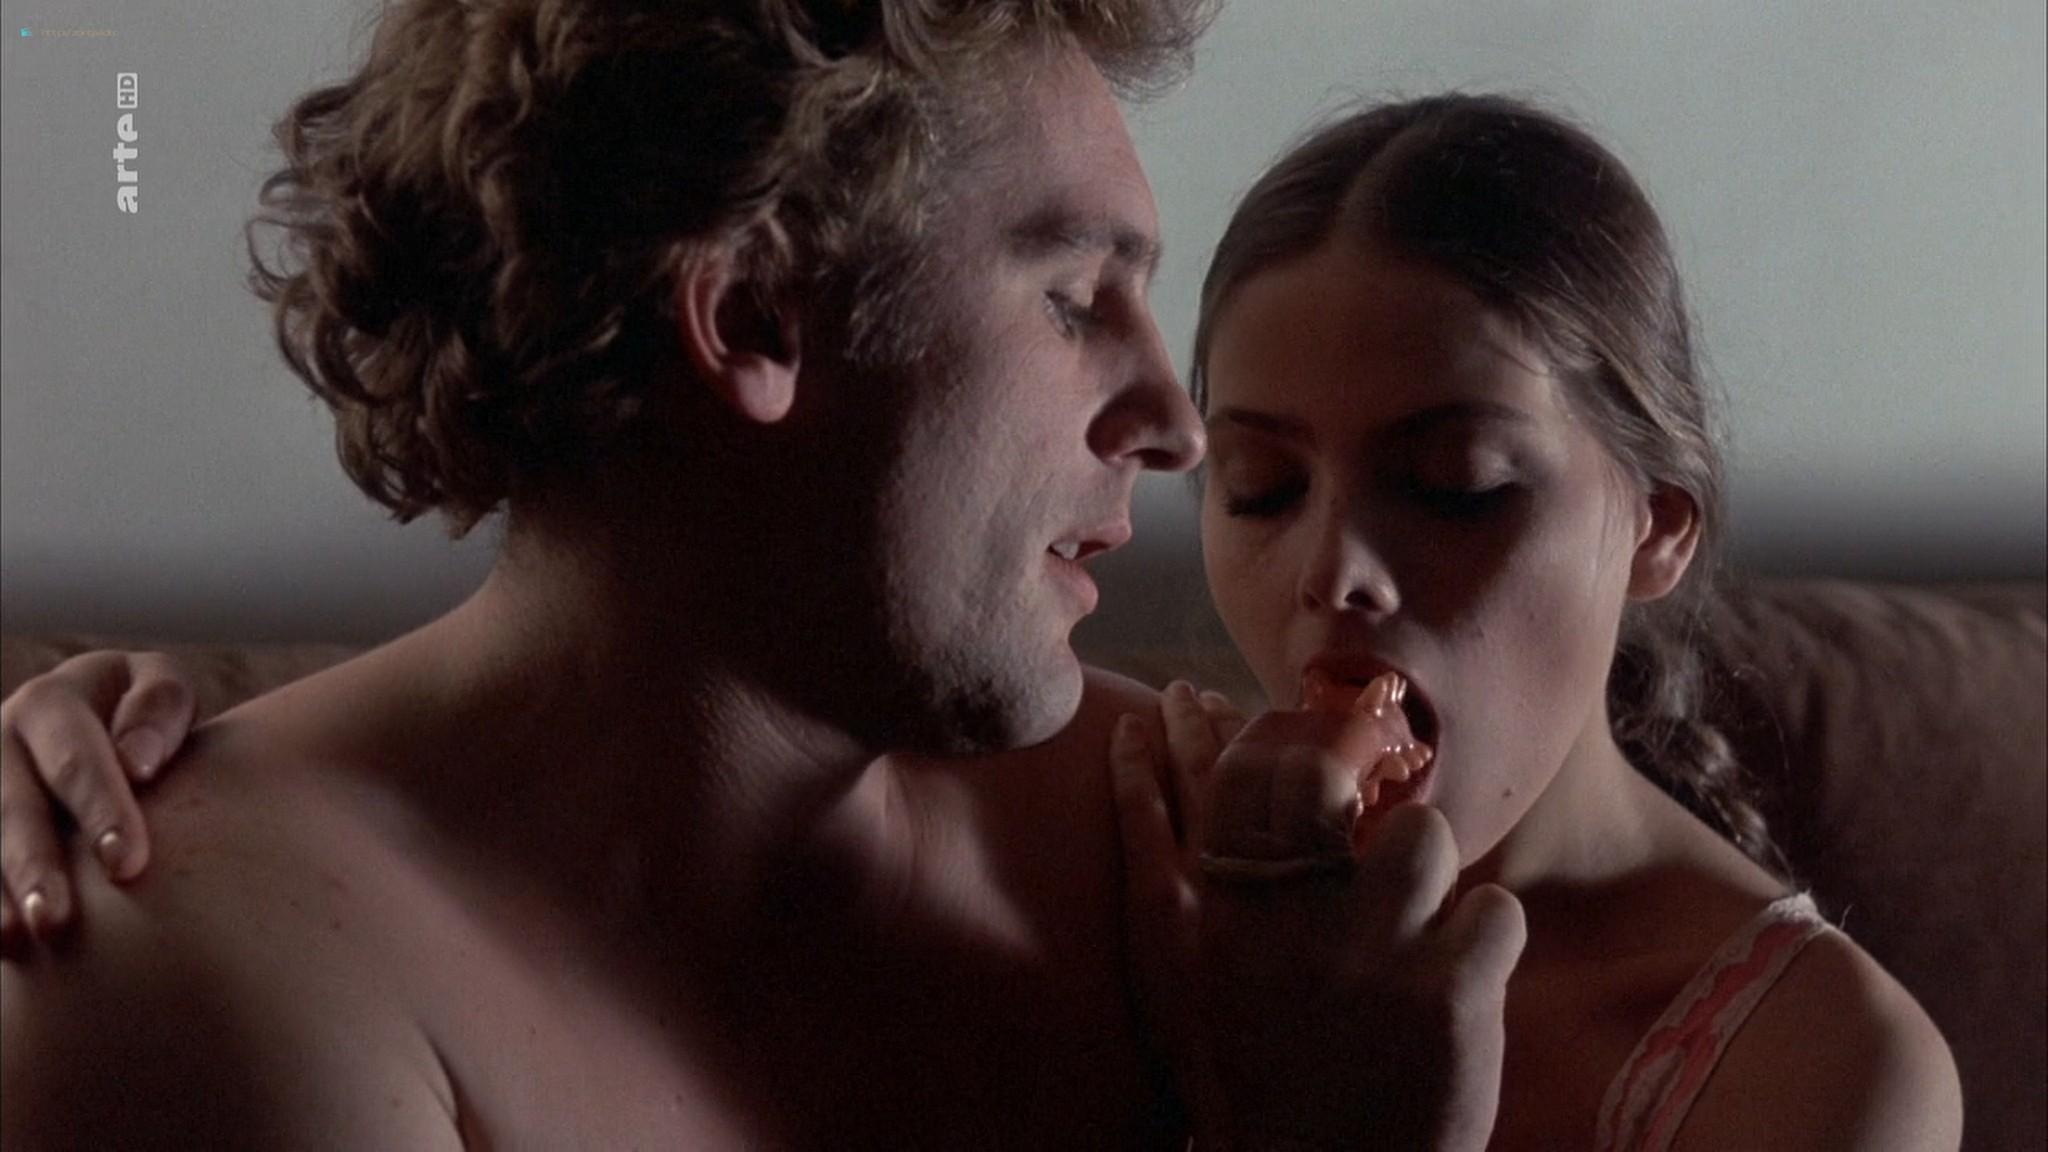 Ornella Muti nude full frontal - La dernière femme (1976) HDTV 1080p (4)